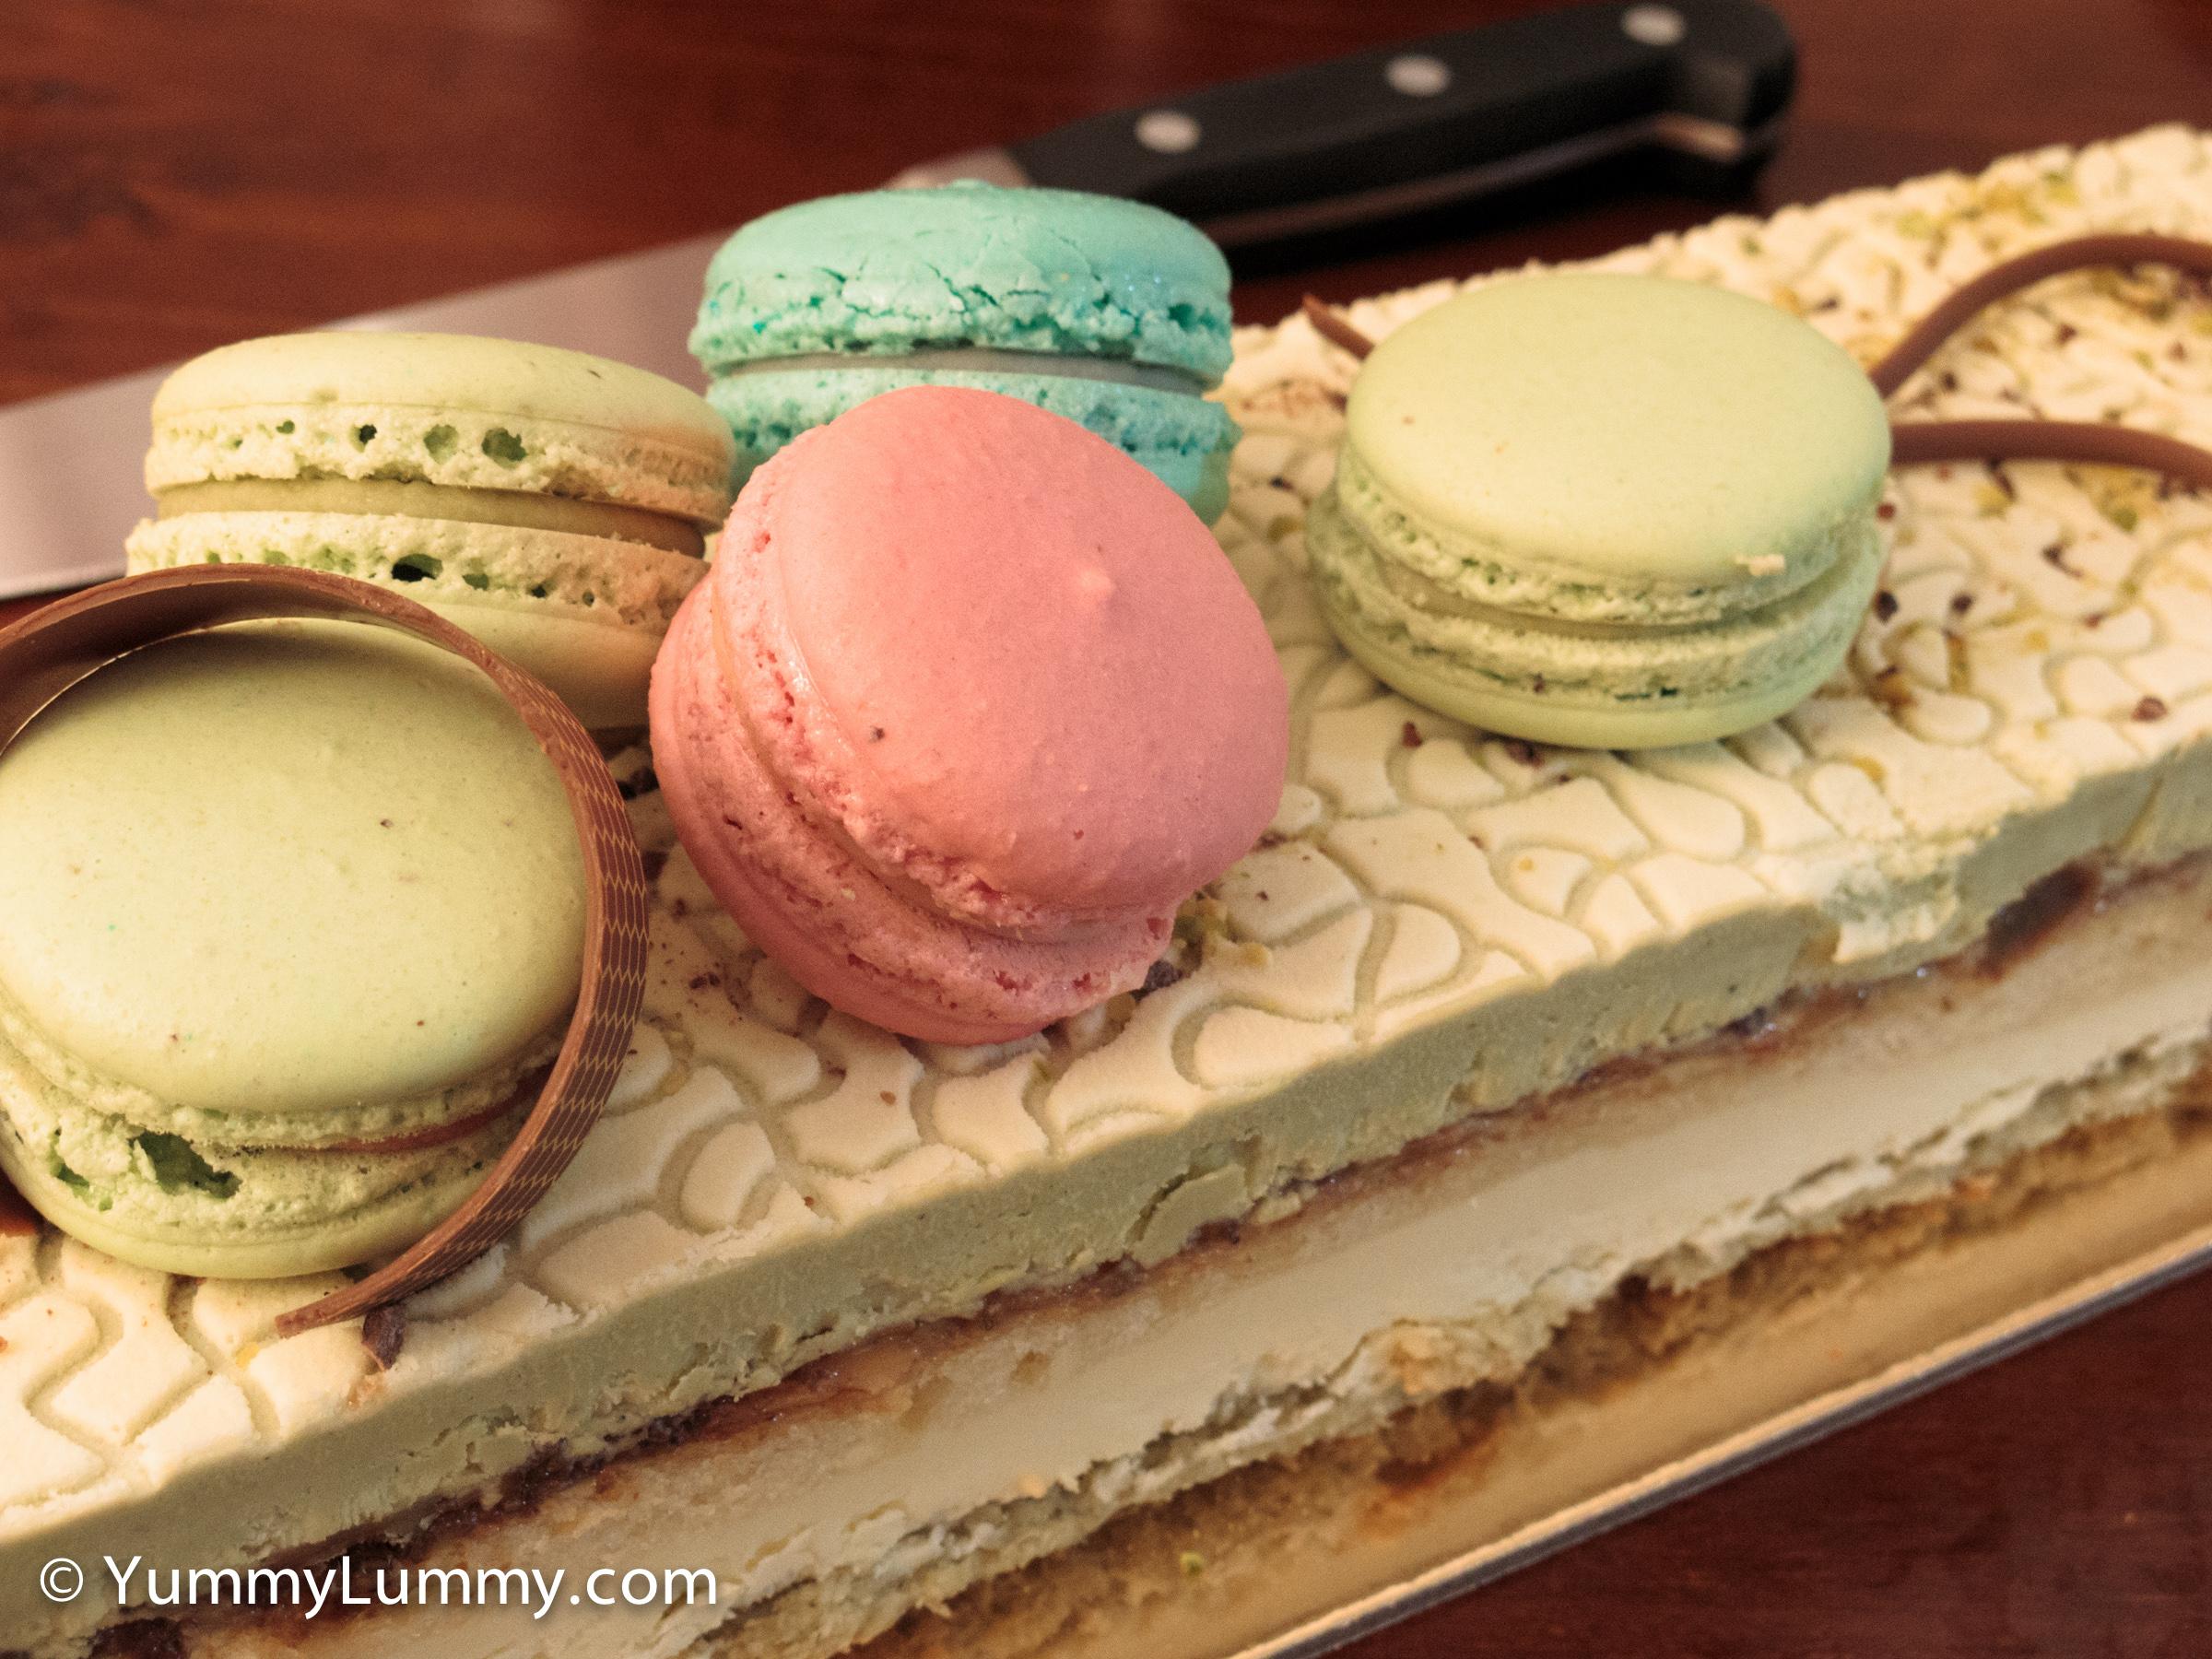 Flute pistachio cake with pistachio and white chocolate bavarois, coconut macaroon, leatherwood honey pistachio nougatine and vanilla cake